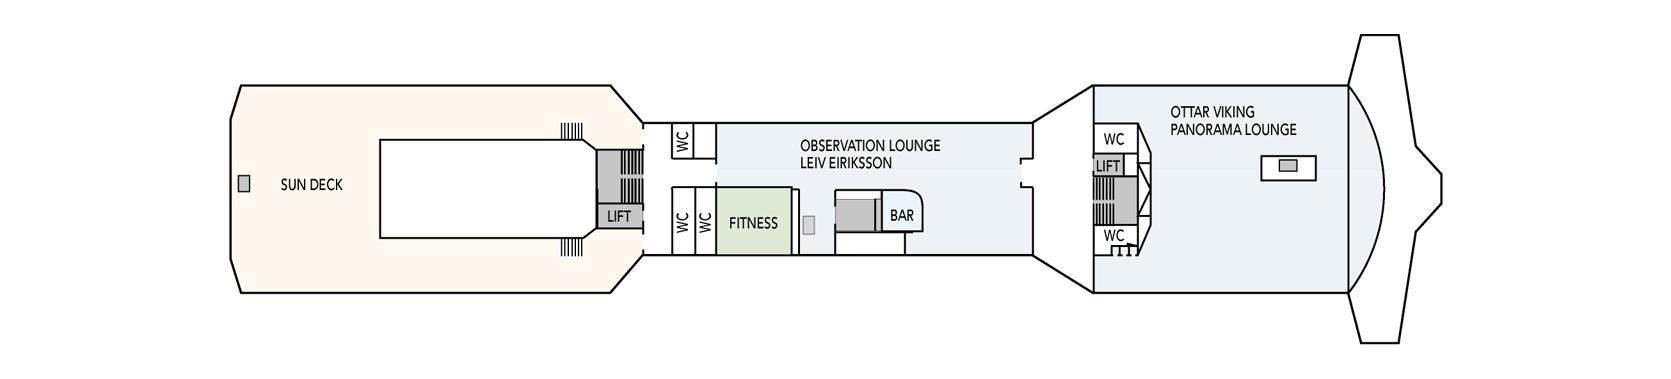 Hurtigruten MS Kong Harald Deck Plans Deck 7.png